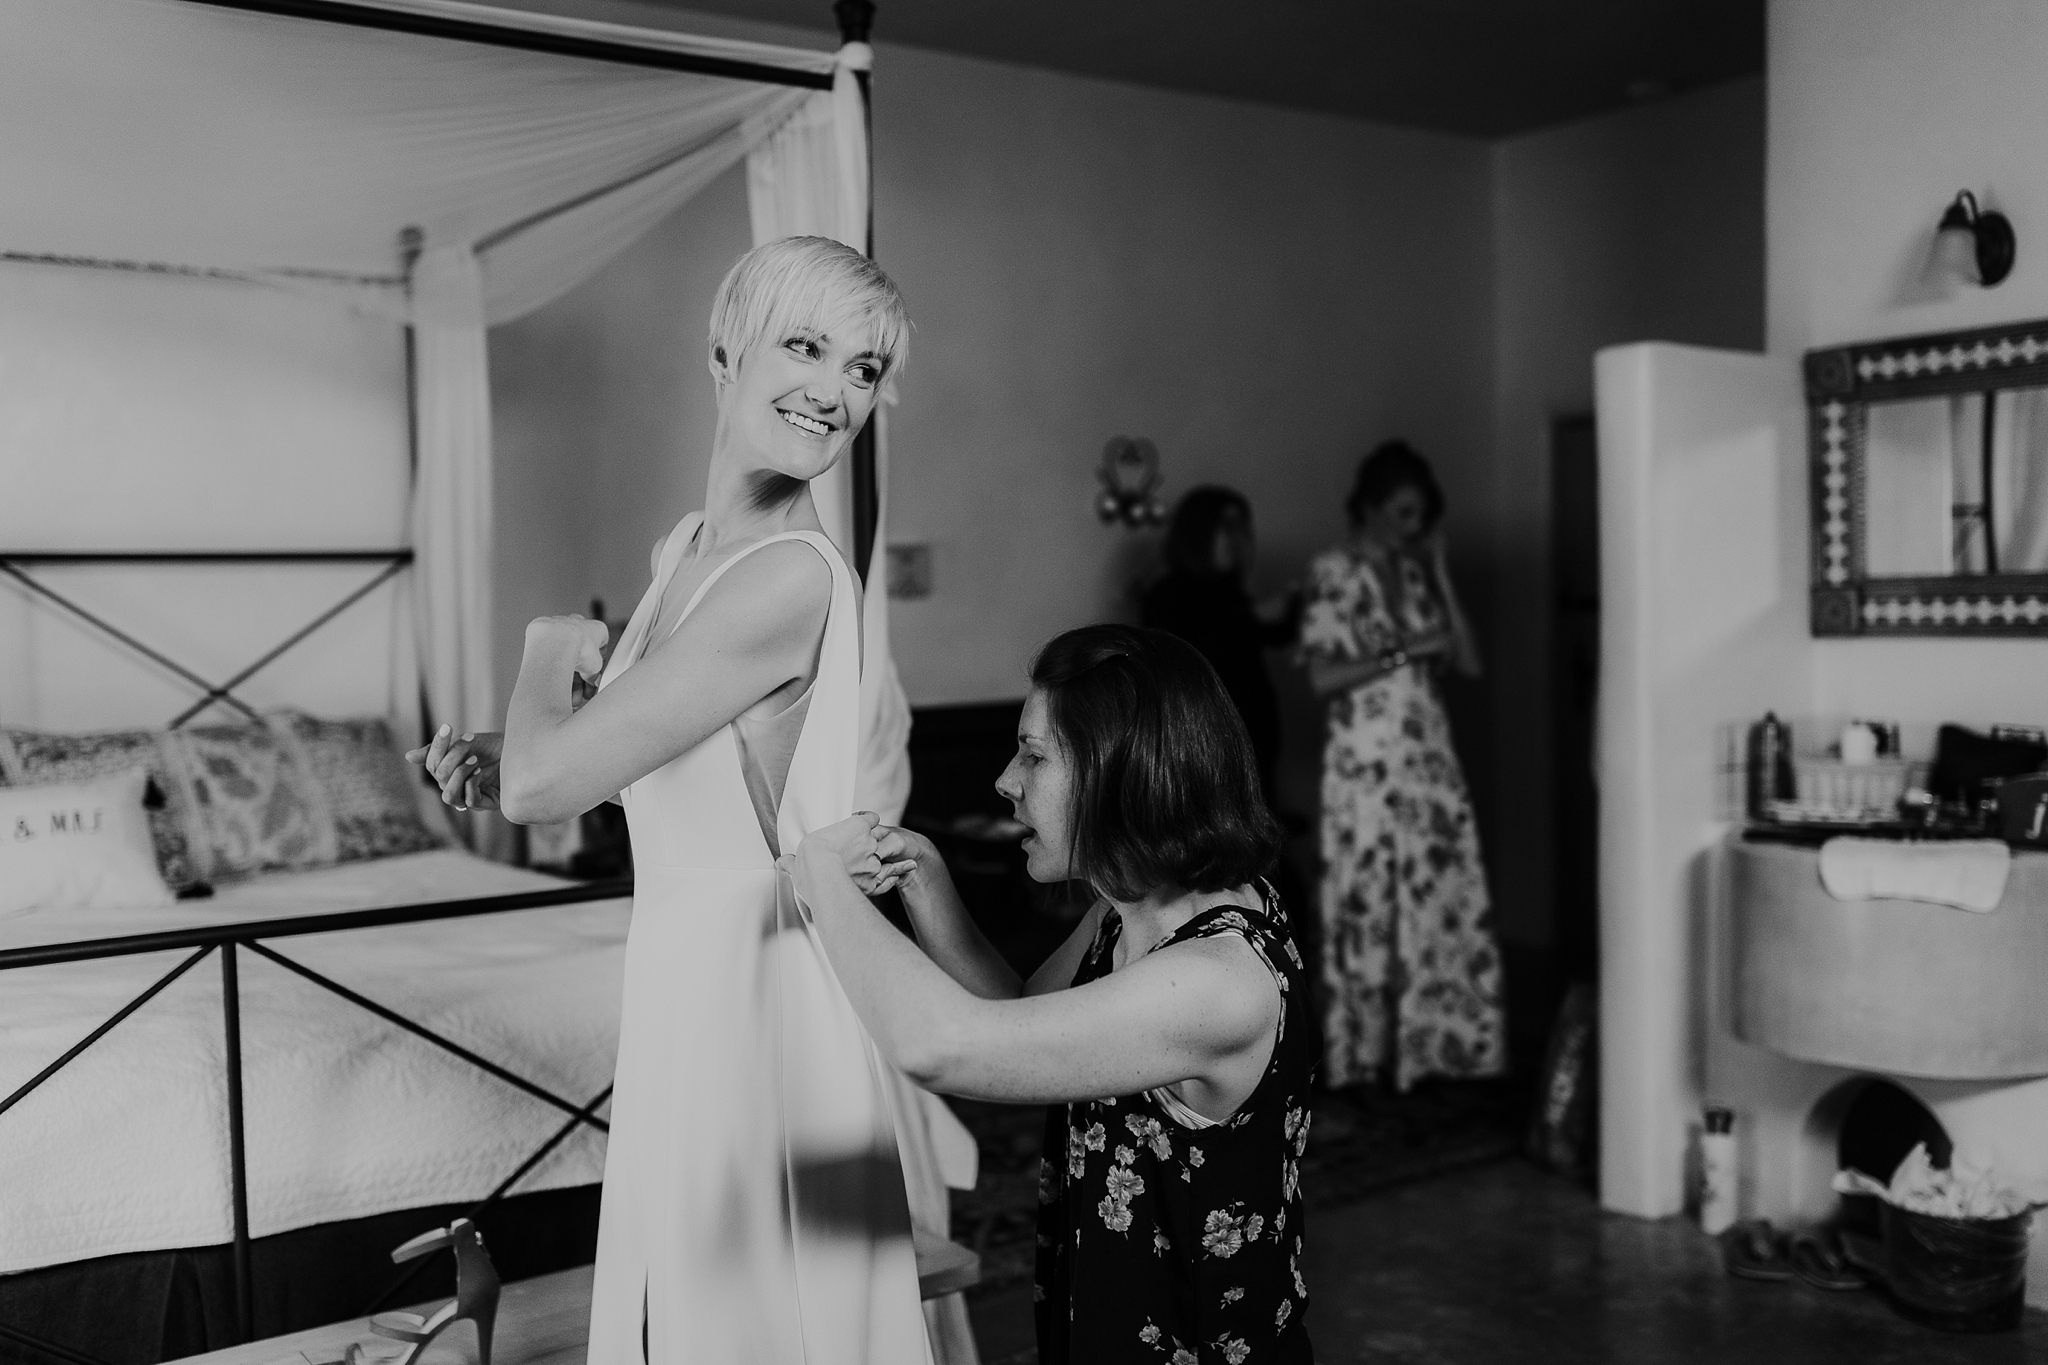 Alicia+lucia+photography+-+albuquerque+wedding+photographer+-+santa+fe+wedding+photography+-+new+mexico+wedding+photographer+-+new+mexico+wedding+-+new+mexico+wedding+-+santa+fe+wedding+-+hacienda+dona+andrea+wedding+-+madrid+wedding_0014.jpg